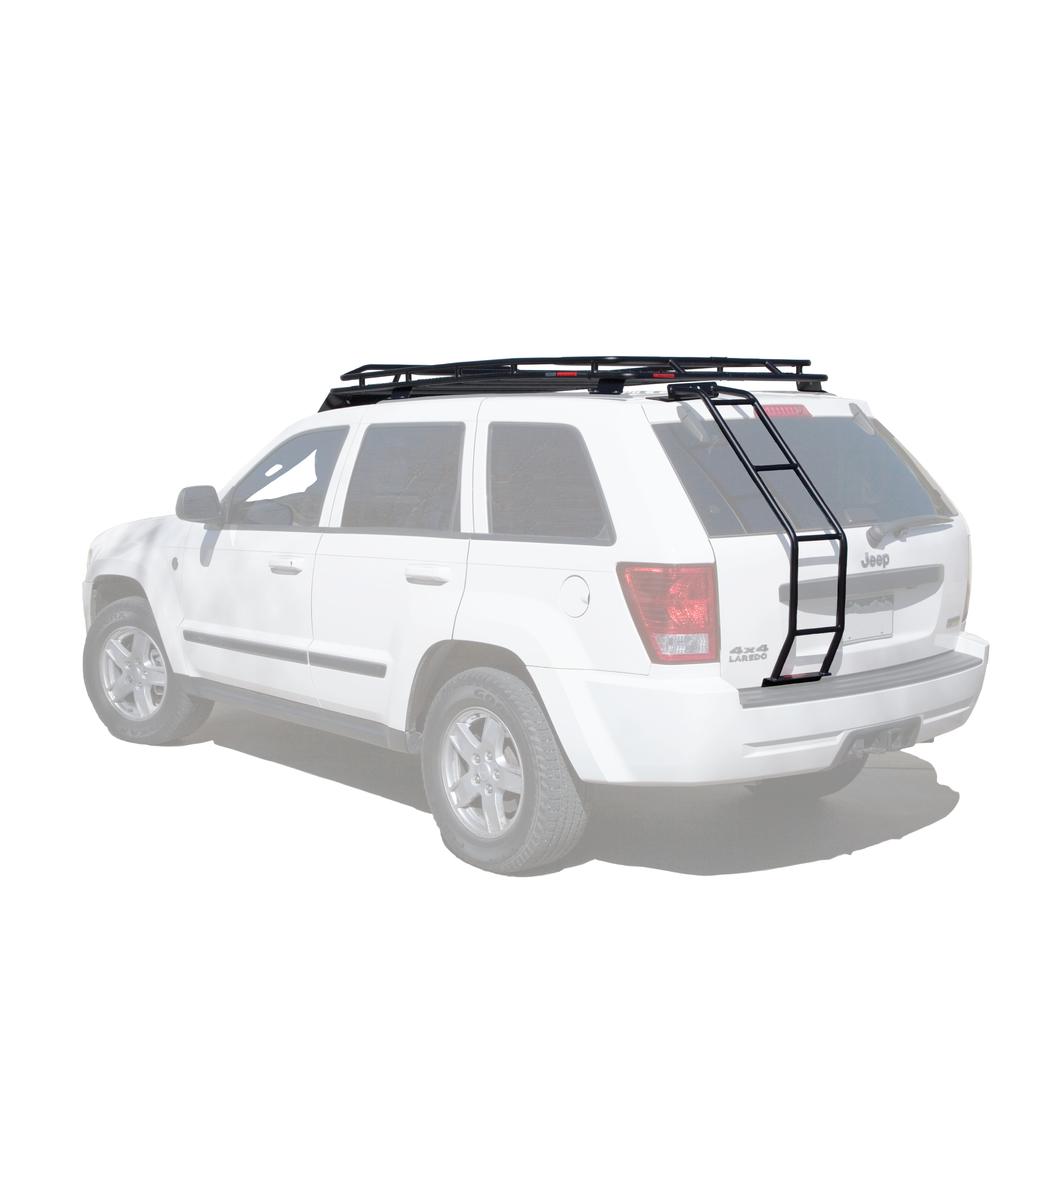 Gobi Jeep Grand Cherokee Wk Stealth Rack No Sunroof